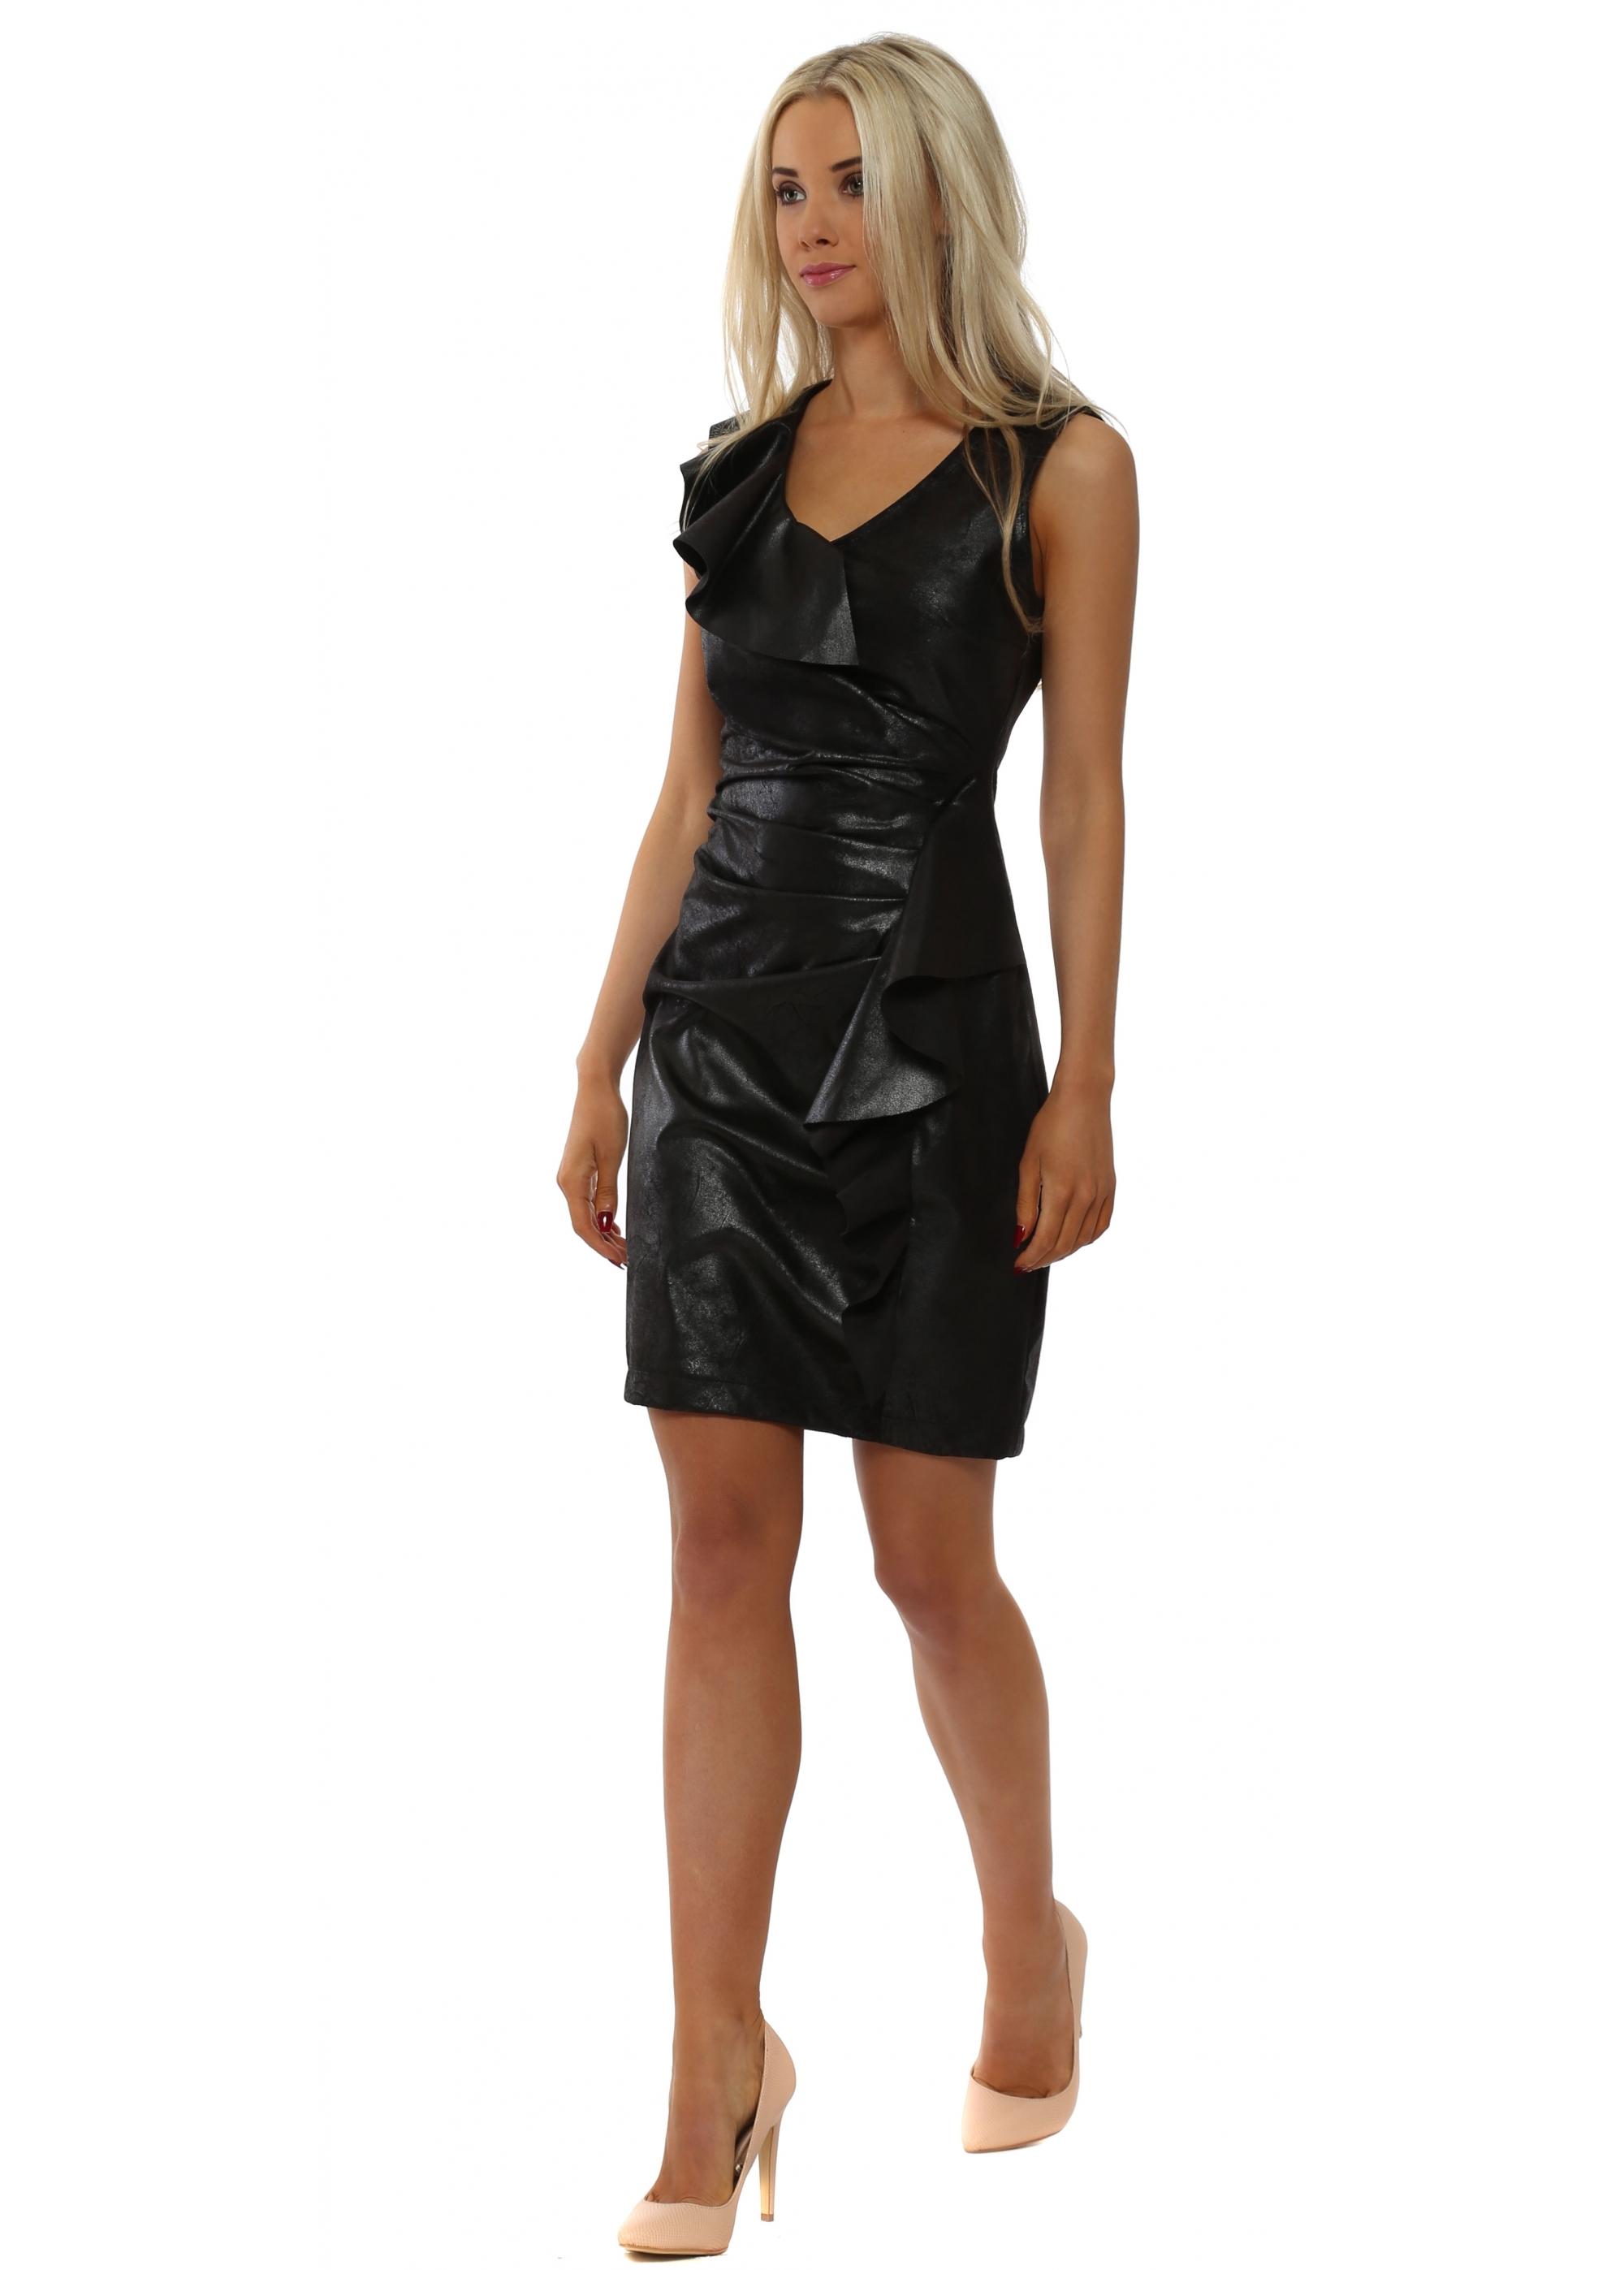 e7d60bdac01 Black Faux Leather Waterfall Frill Pencil Dress